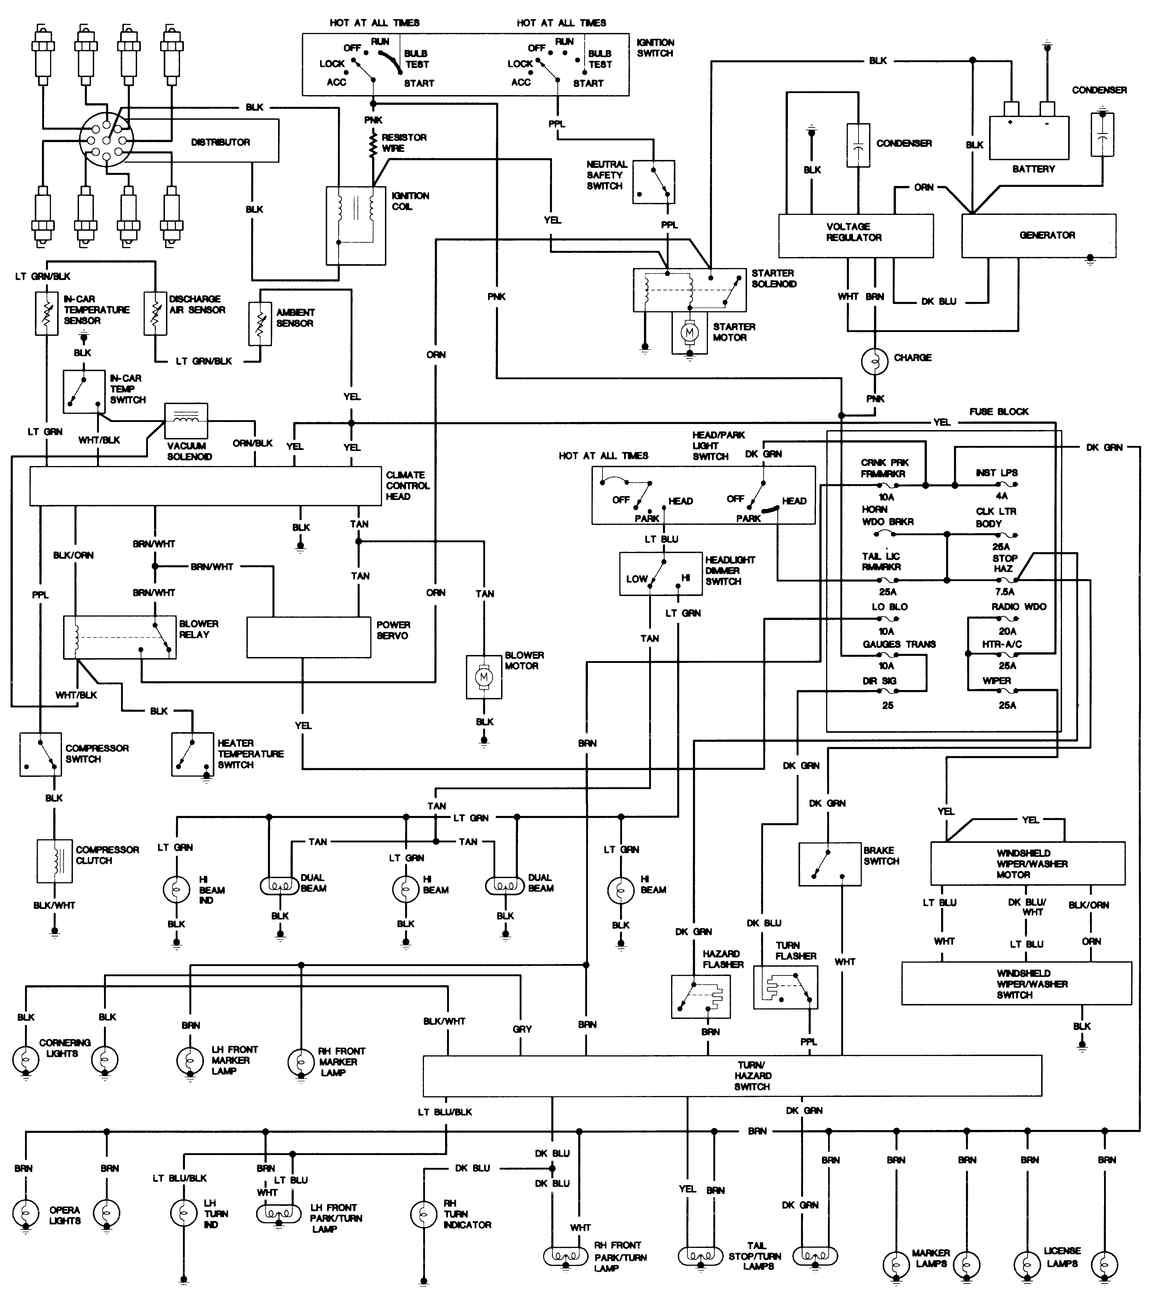 KG_1834] 1970 Cadillac Deville Wiring Diagram On 1969 Camaro Window Diagram  Wiring DiagramItis Stre Over Marki Xolia Mohammedshrine Librar Wiring 101